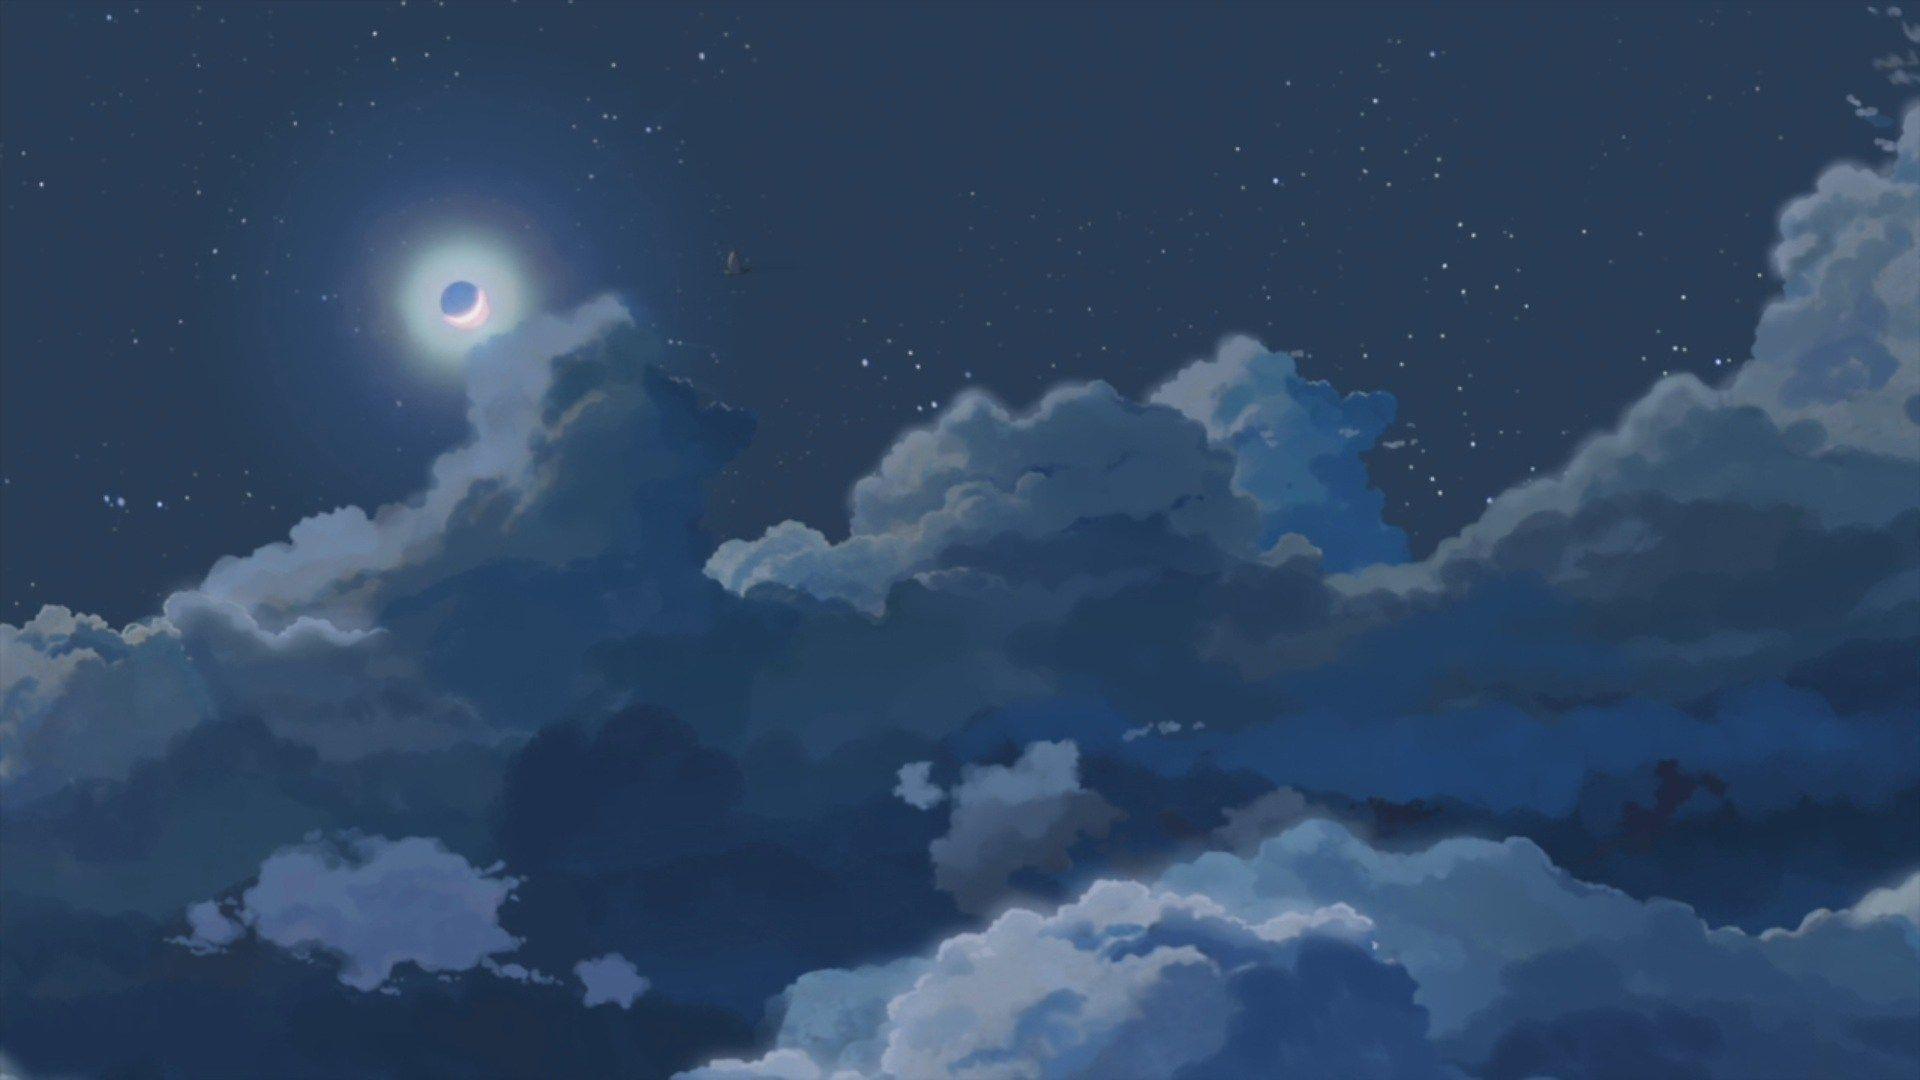 1920x1080 Aesthetic Background Anime